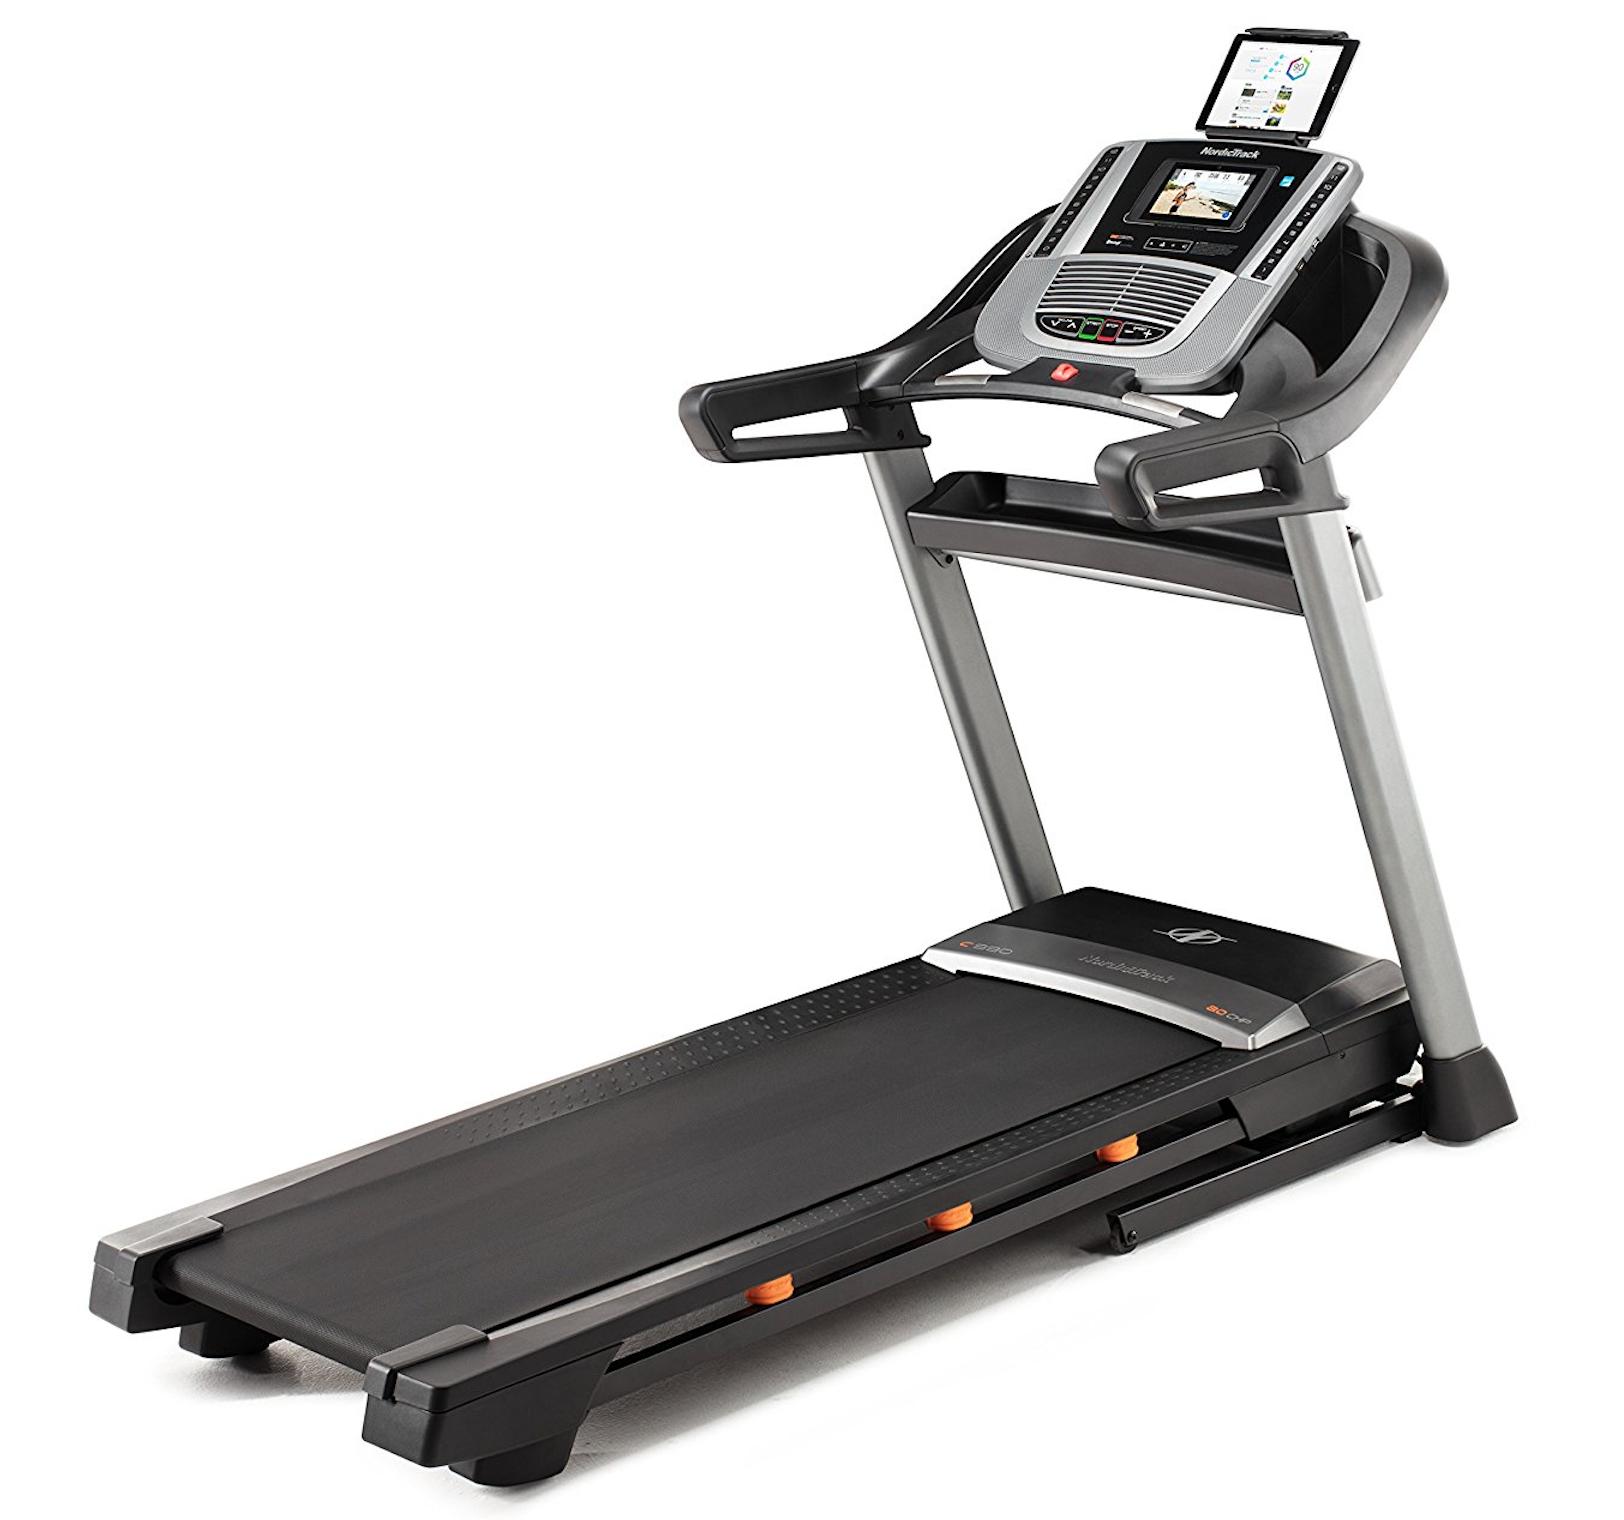 Wiring Diagram Nordictrack Treadmill : Nordictrack c treadmill review machines